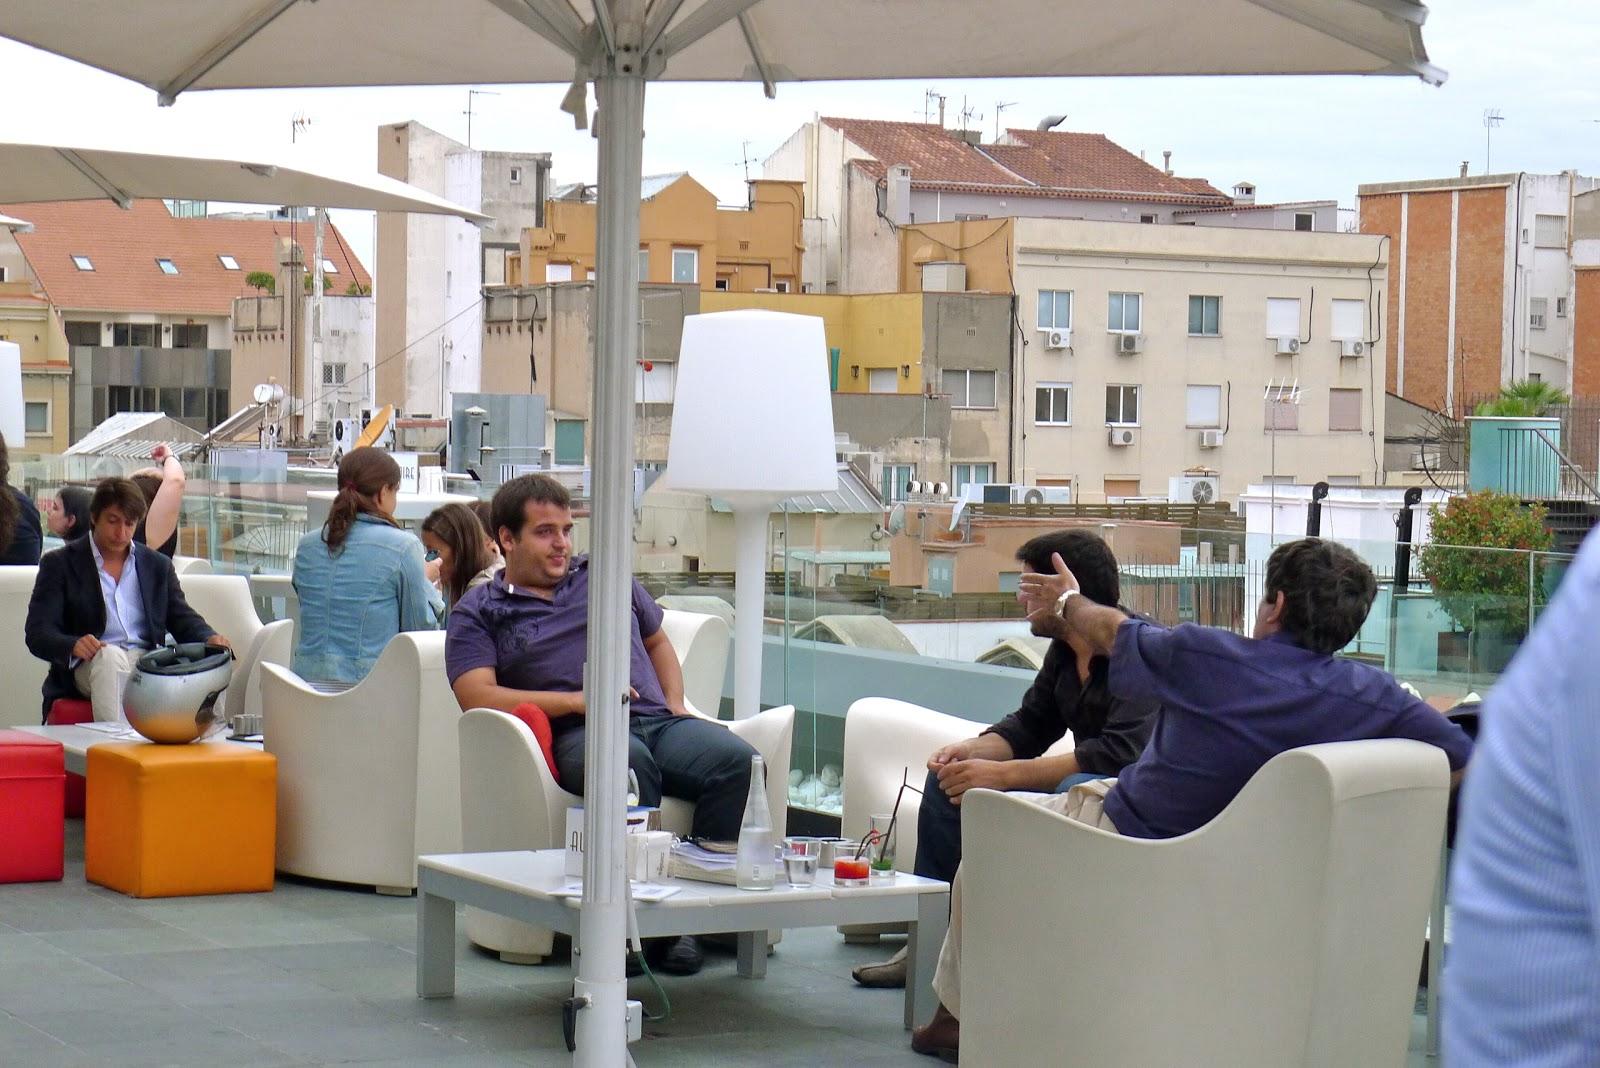 Be in barcelona terraza hotel condes de barcelona for La terraza barcelona